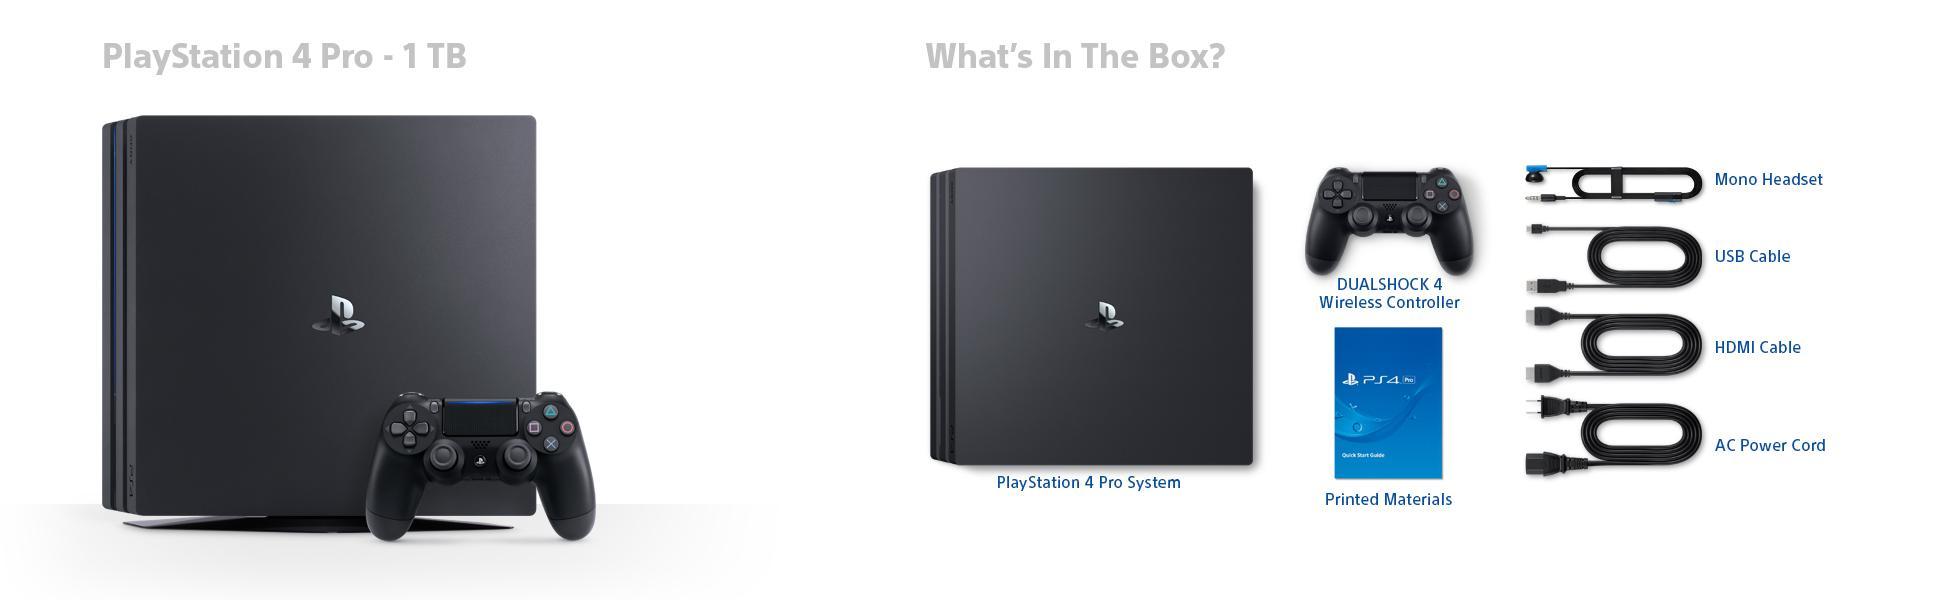 sony playstation 4 pro. dualshock 4 wireless controller sony playstation pro 2